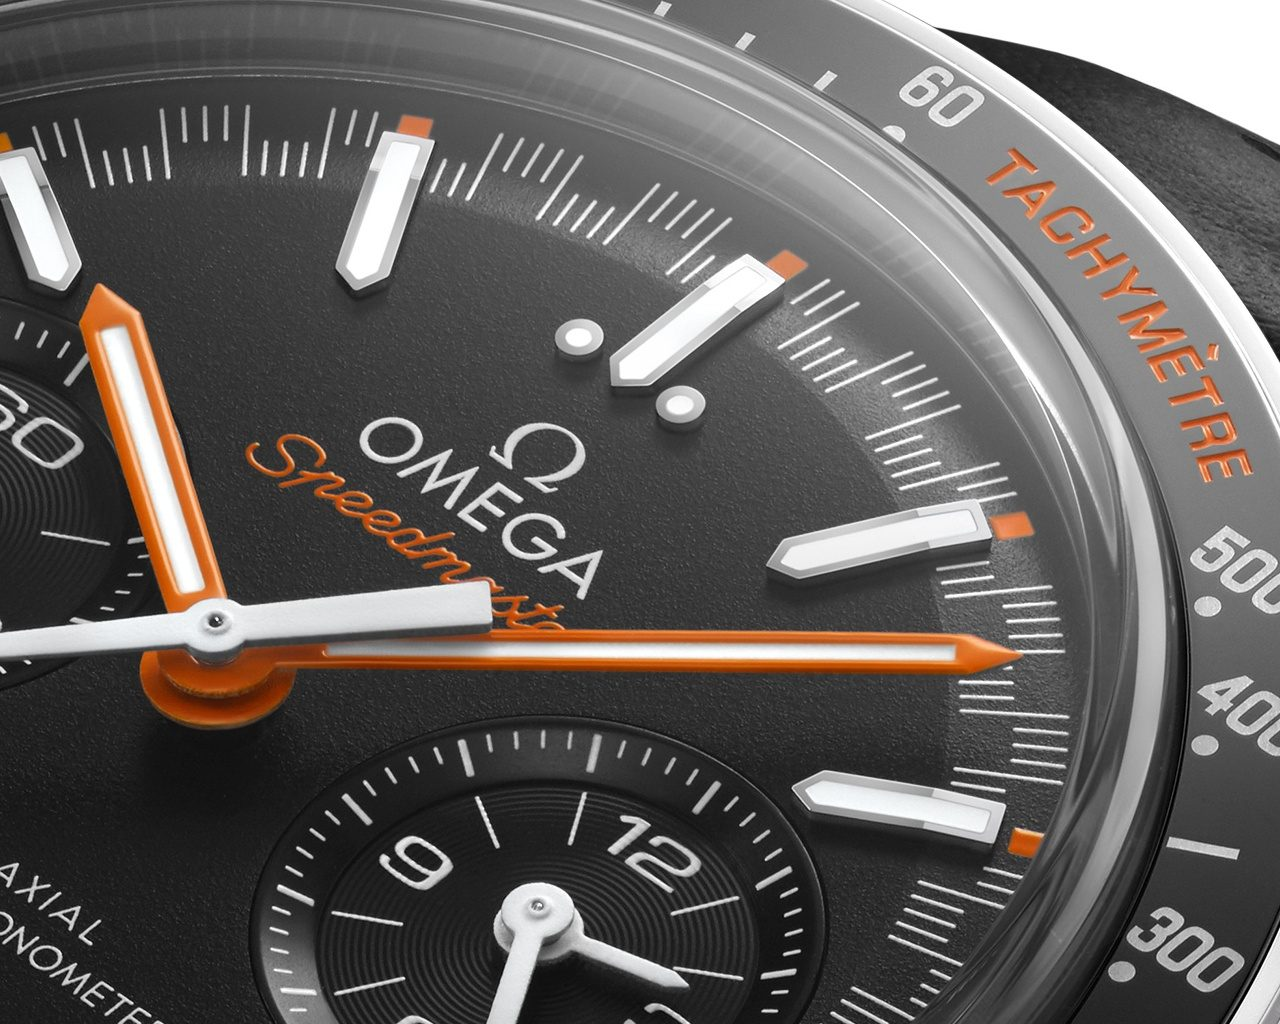 anteprima-baselworld-2017-omega-speedmaster-automatic-prezzo-price_0-1004